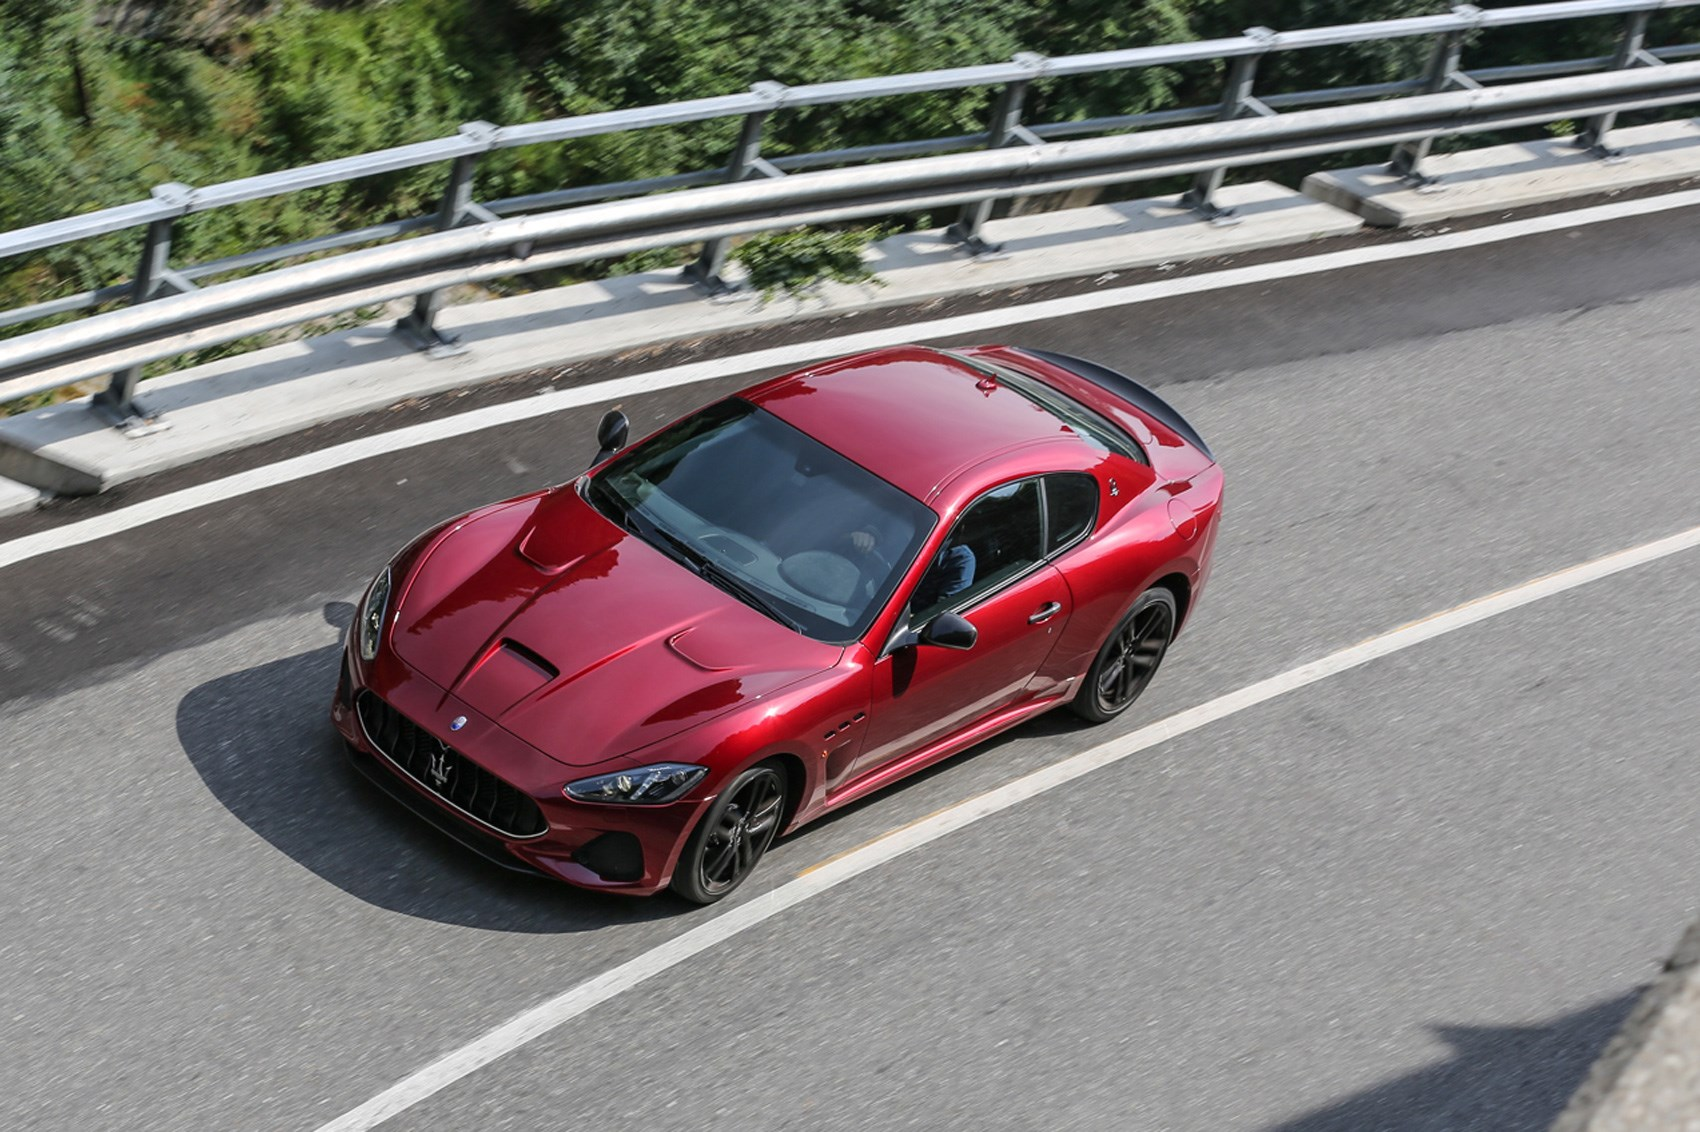 Maserati GranTurismo 2018 model year